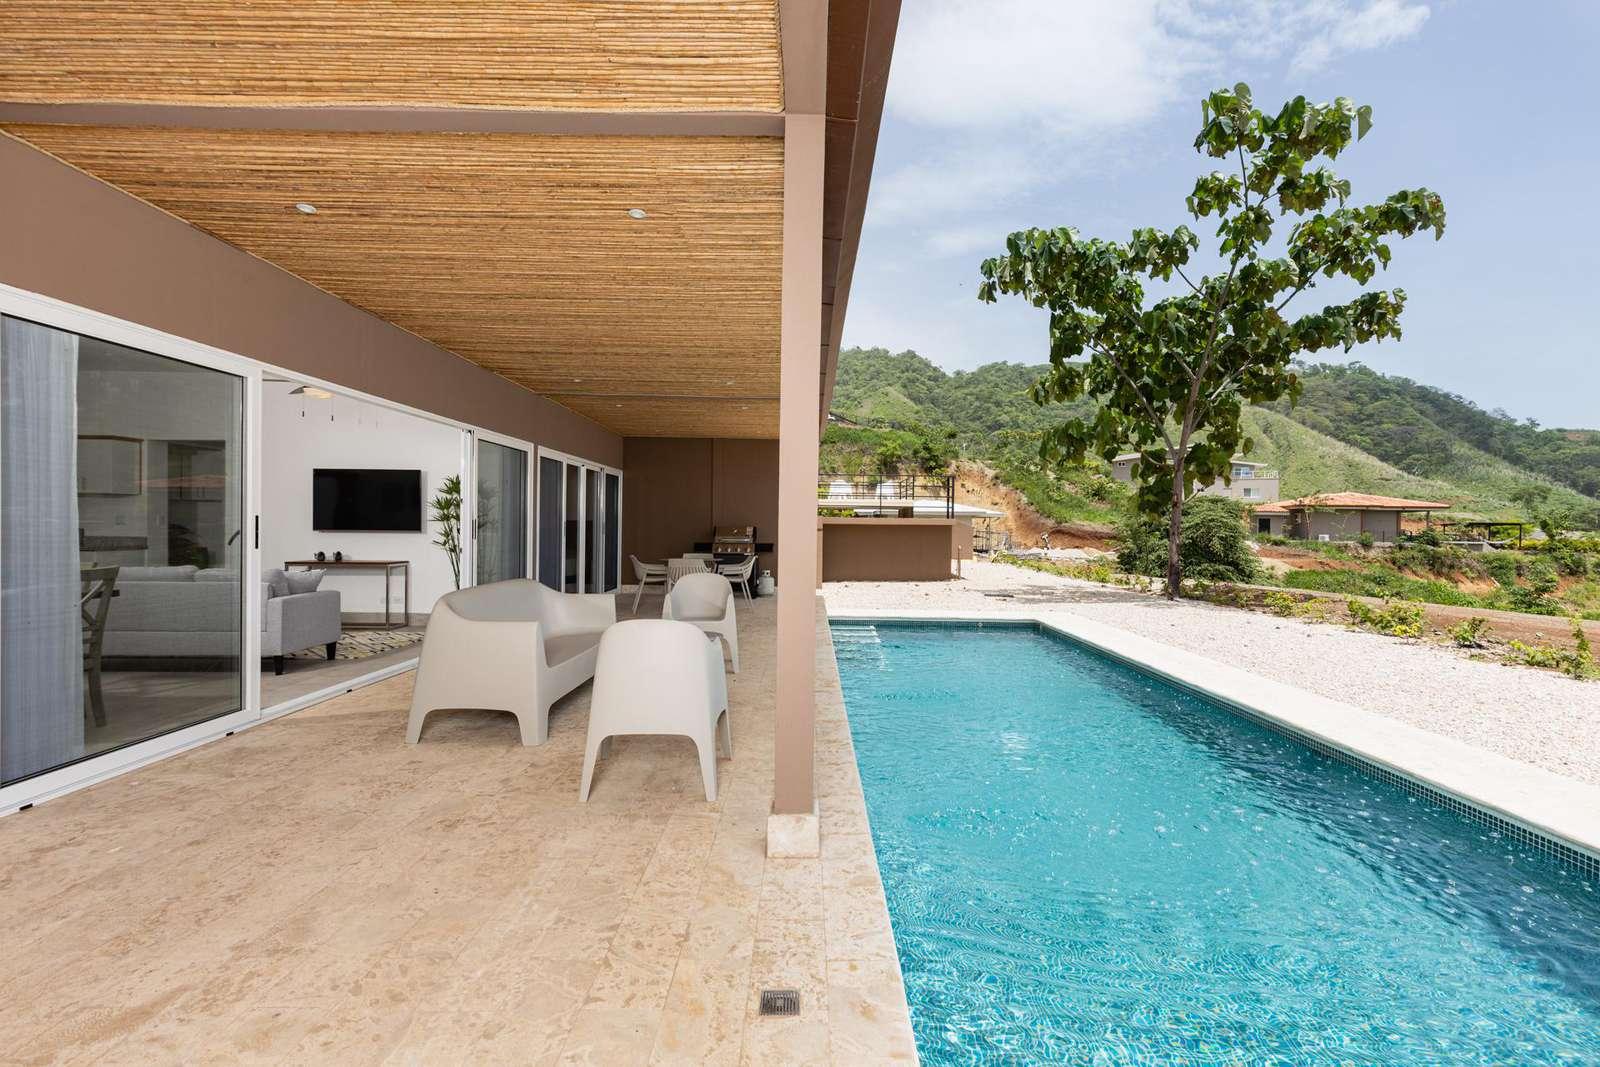 Dos Rios 44B, a brand new ocean view home at Mar Vista - property